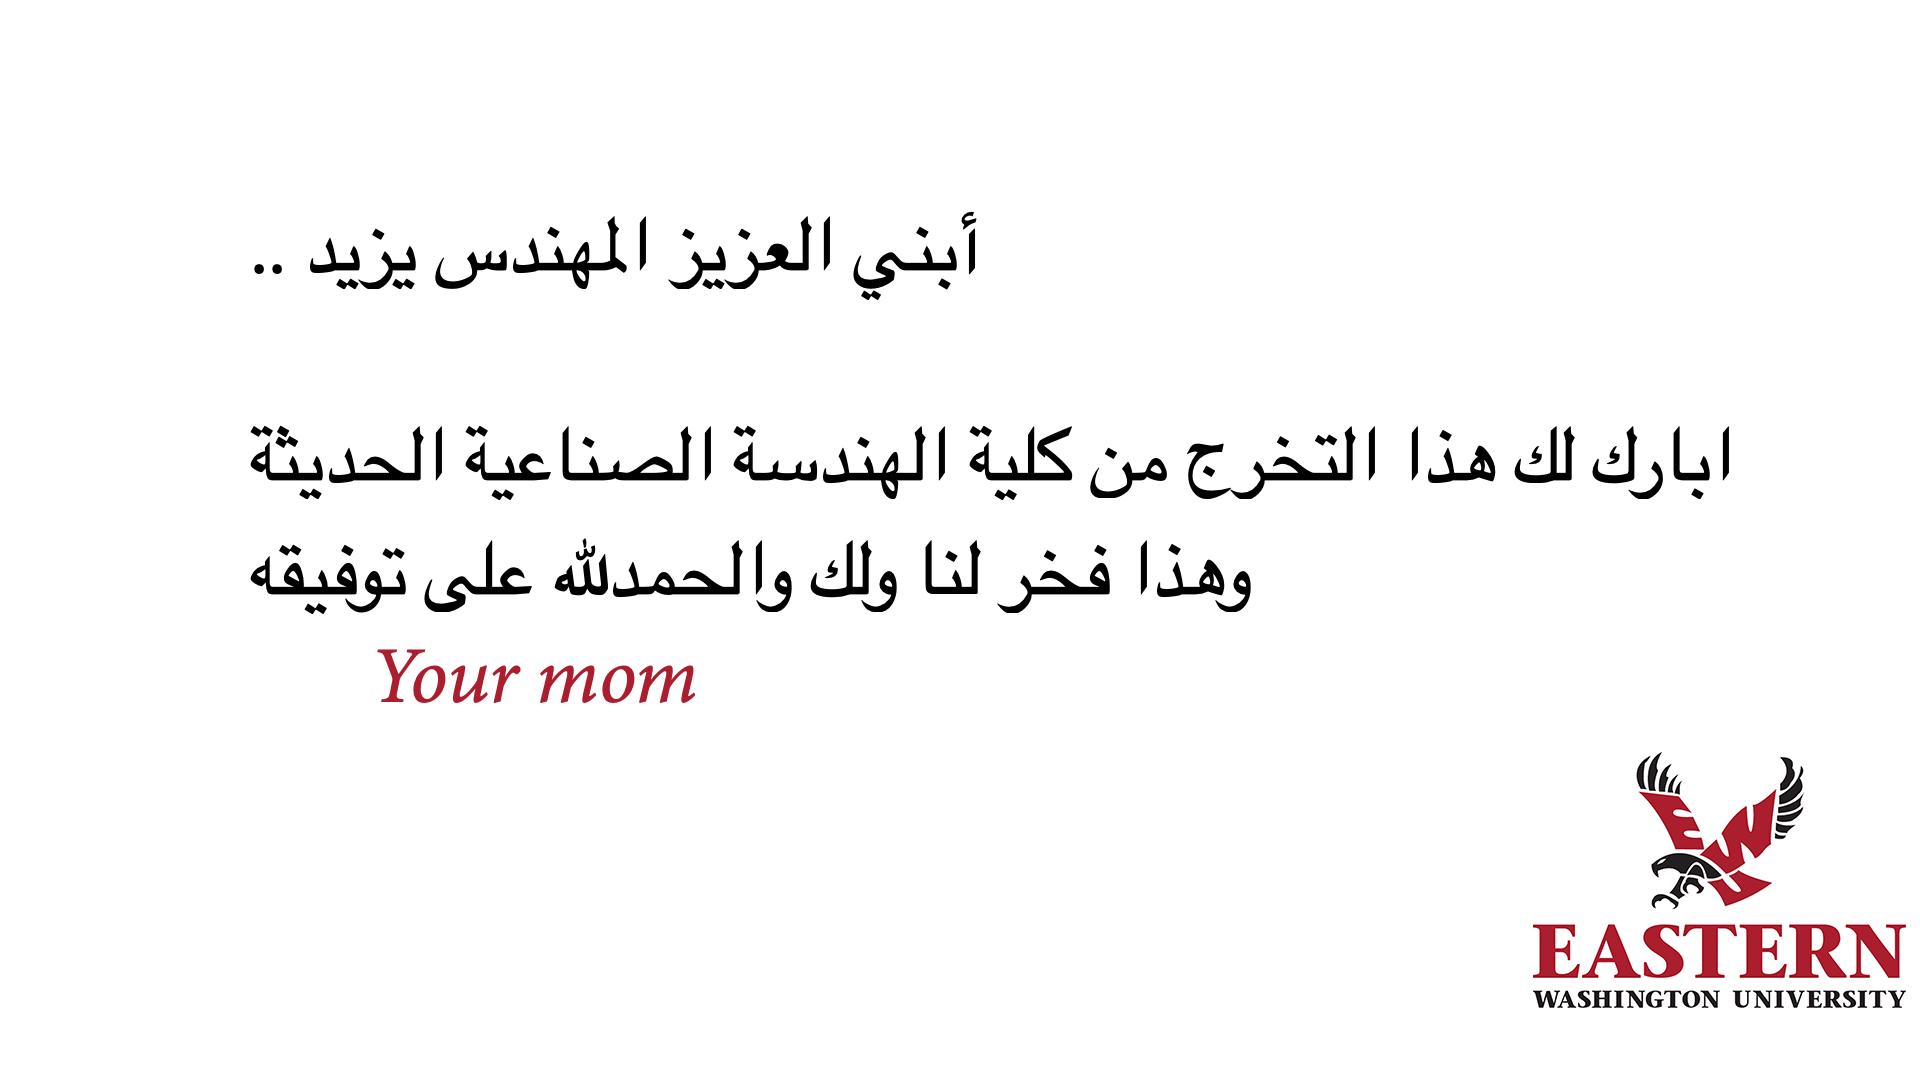 tbi_yazid-abdullah-a-alghafis_6739.png